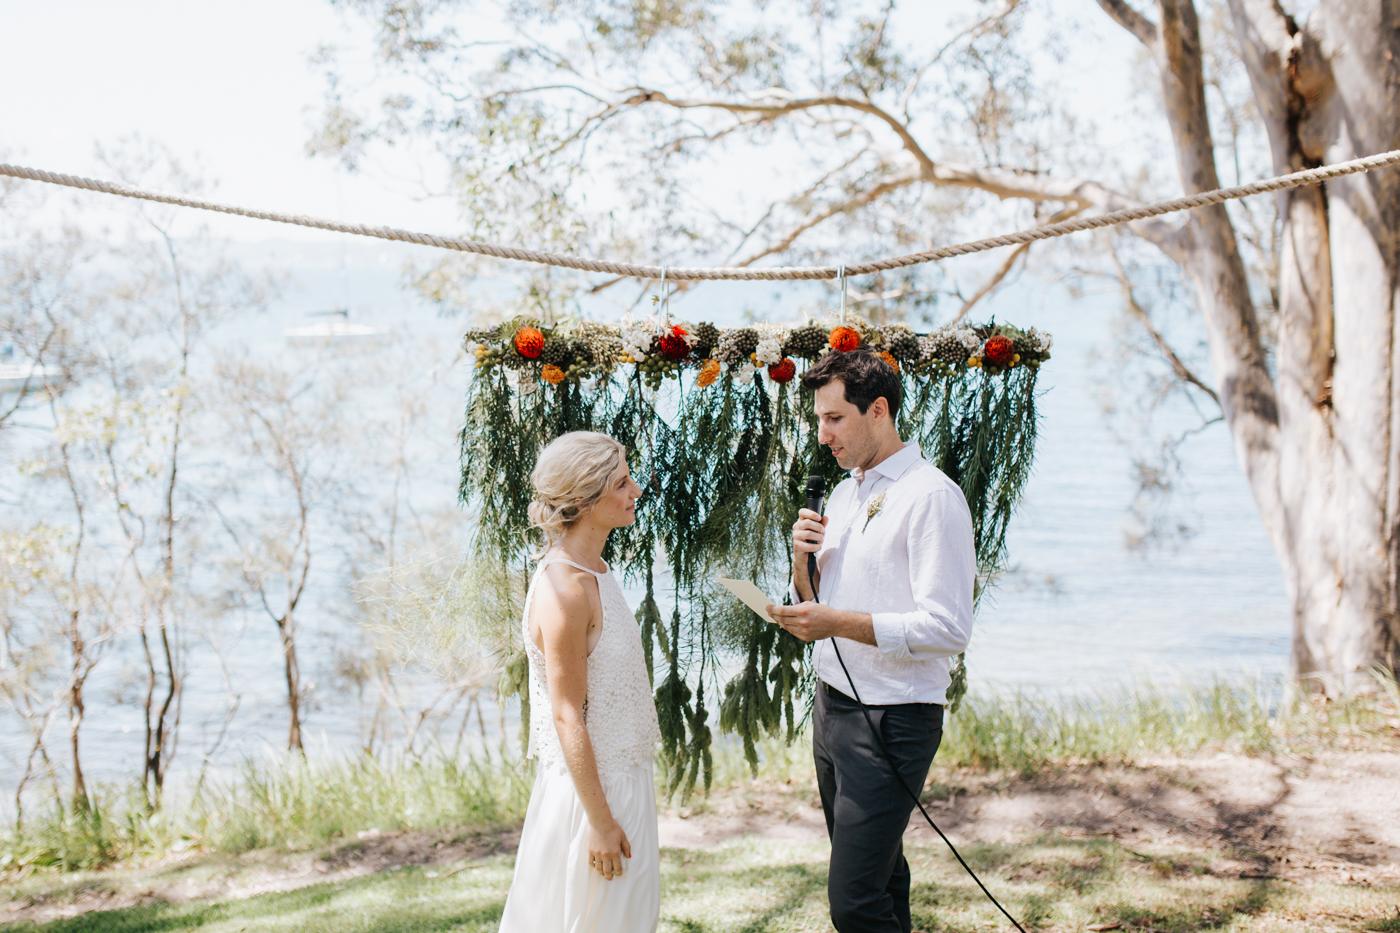 Emma & Ben - Lake Macquarie - Hunter Valley Wedding - Samantha Heather Photography-109.jpg